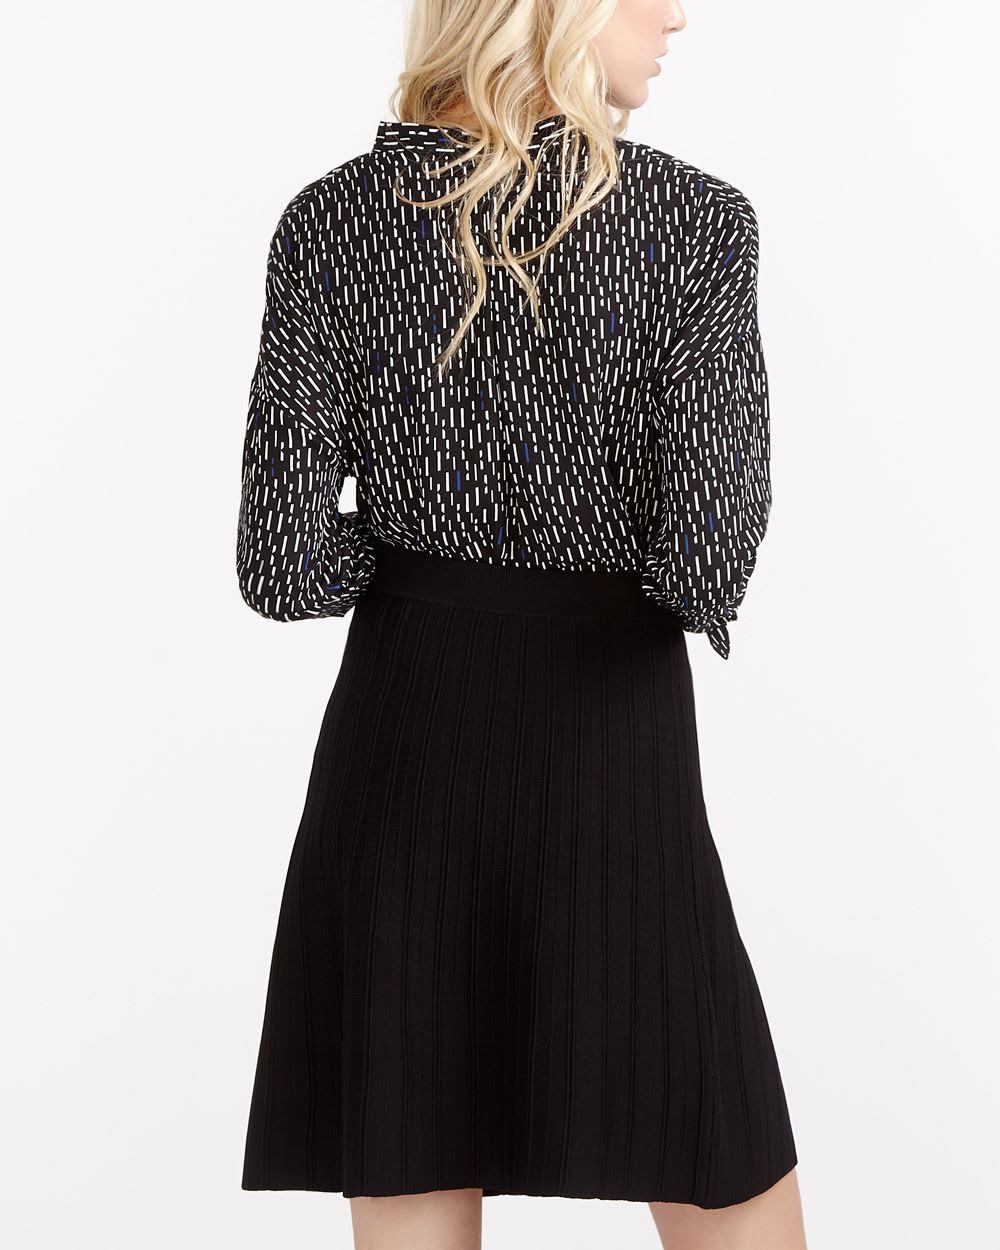 Willow & Thread Pleated Skirt